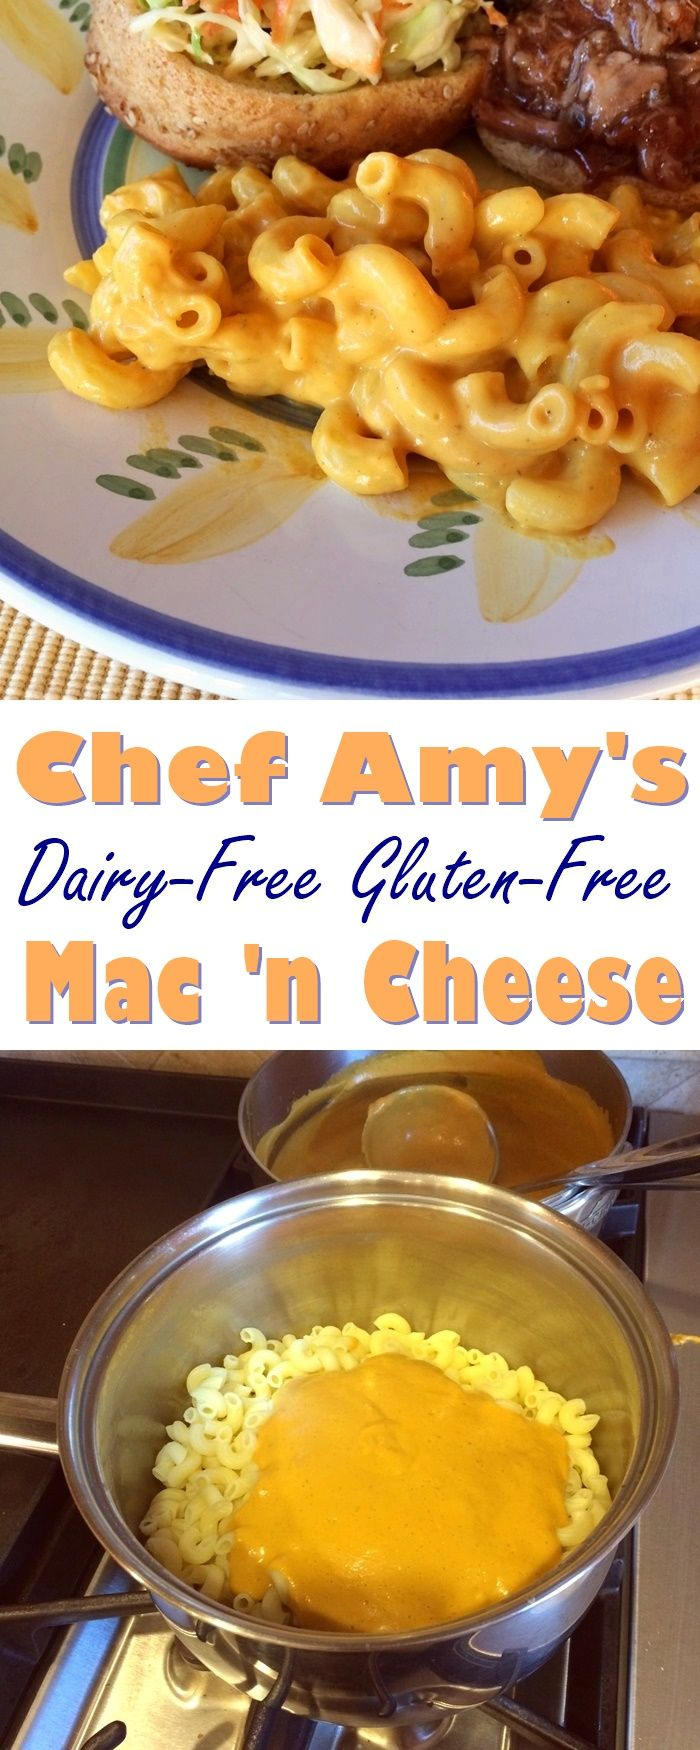 Chef Amy S Gluten Free Macaroni W Dairy Free Cheese Recipe Recipe Dairy Free Recipes Dairy Free Dairy Free Cheese Recipe